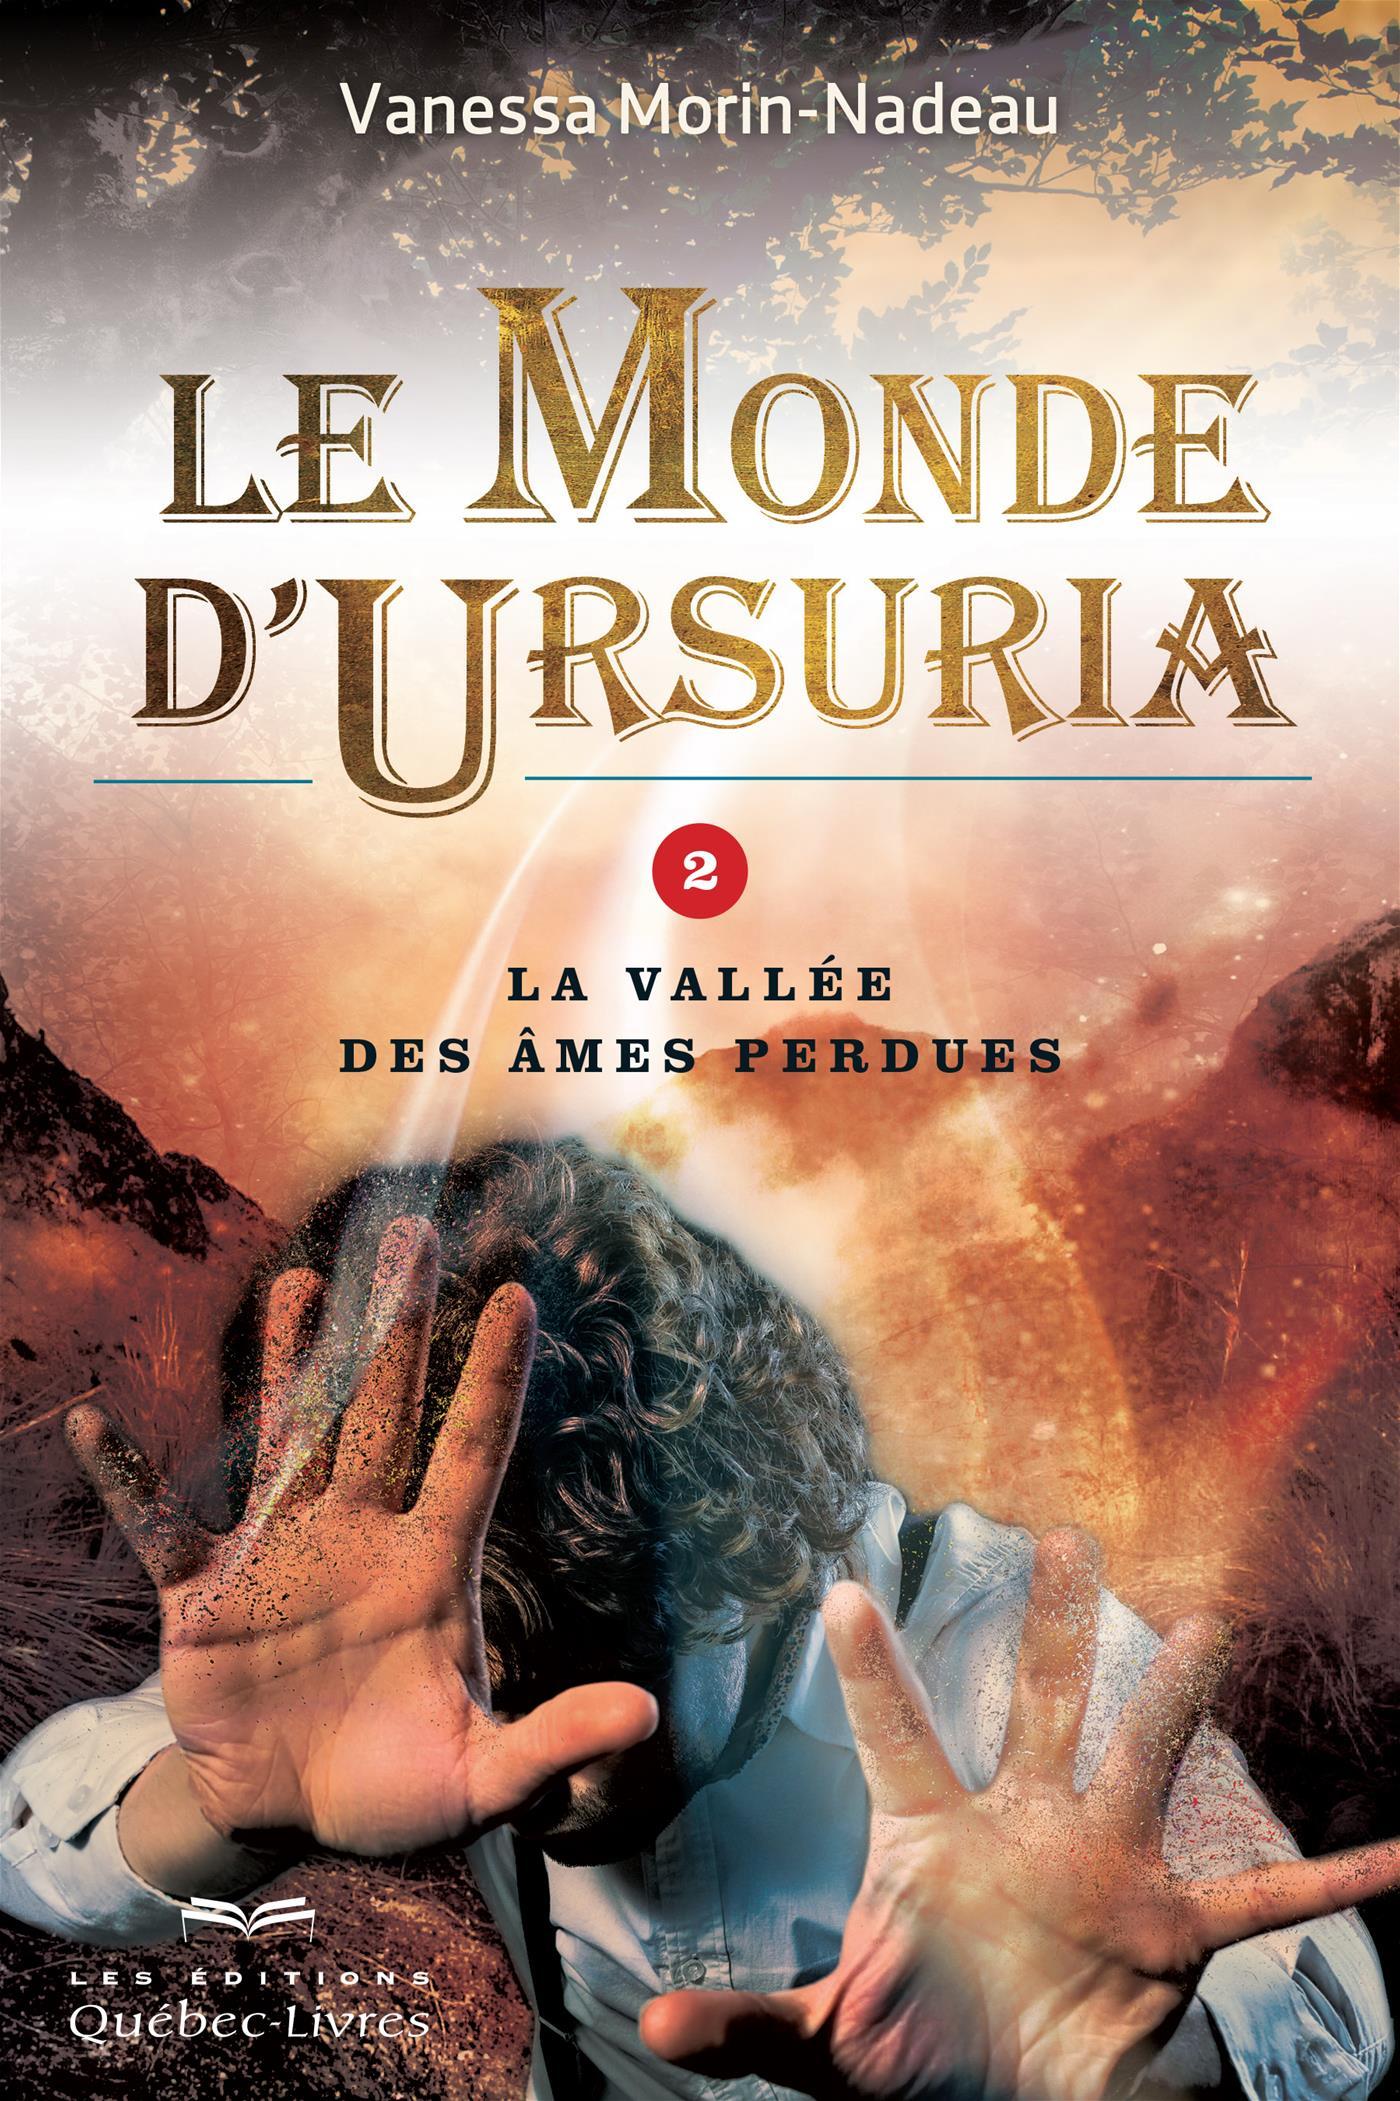 Le monde d'Ursuria - Tome 2